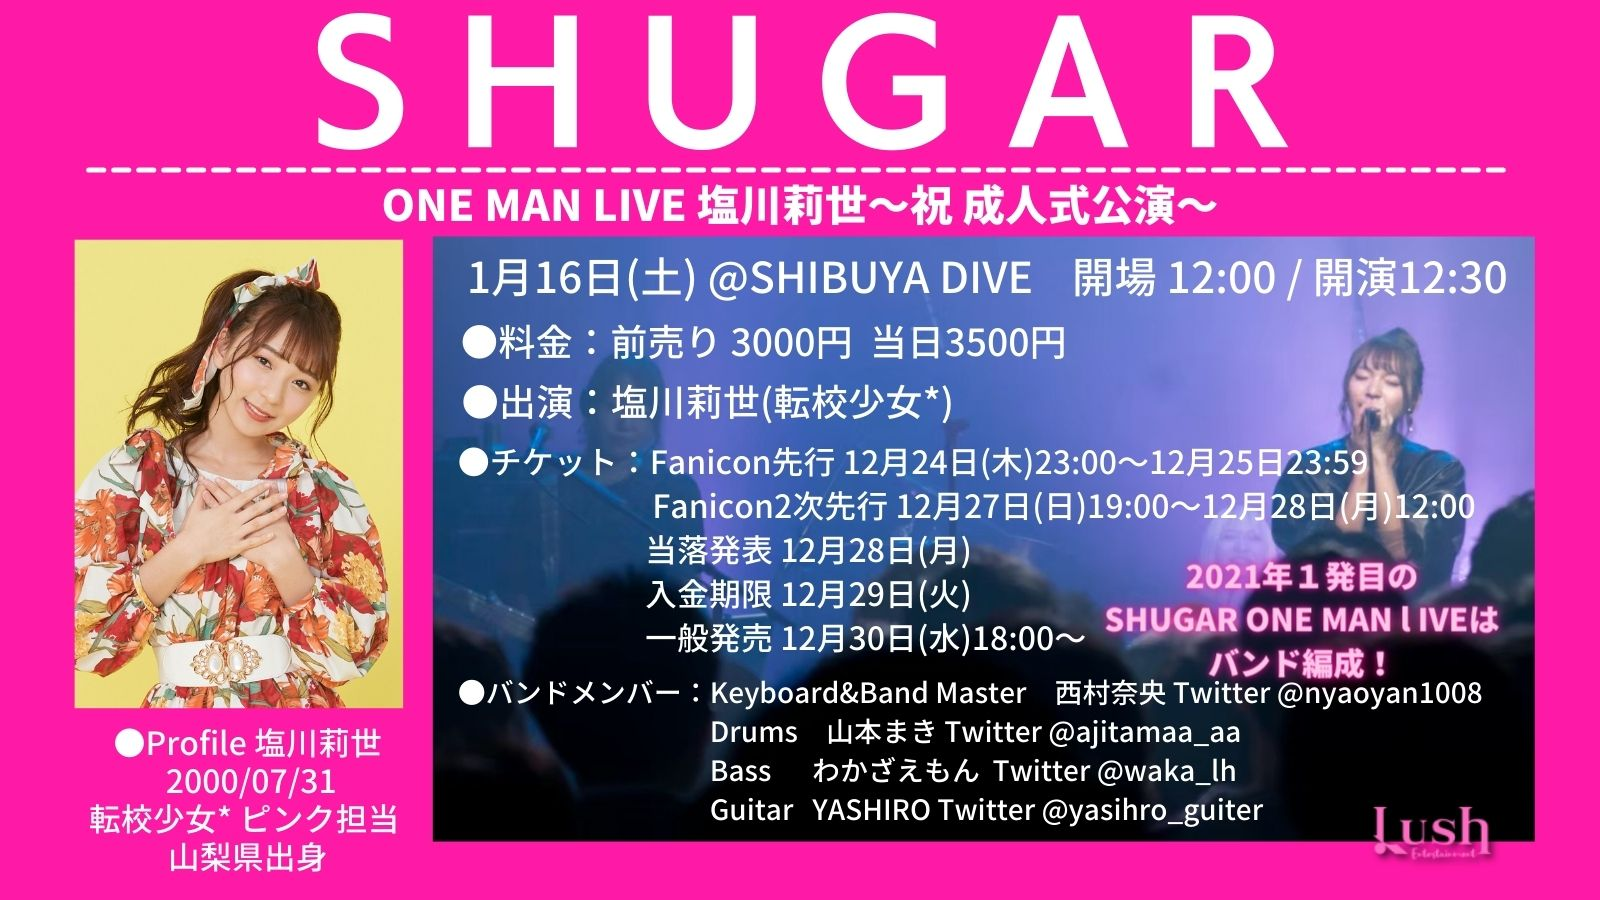 SHUGAR ONE MAN LIVE 塩川莉世 ㊗️成人式公演